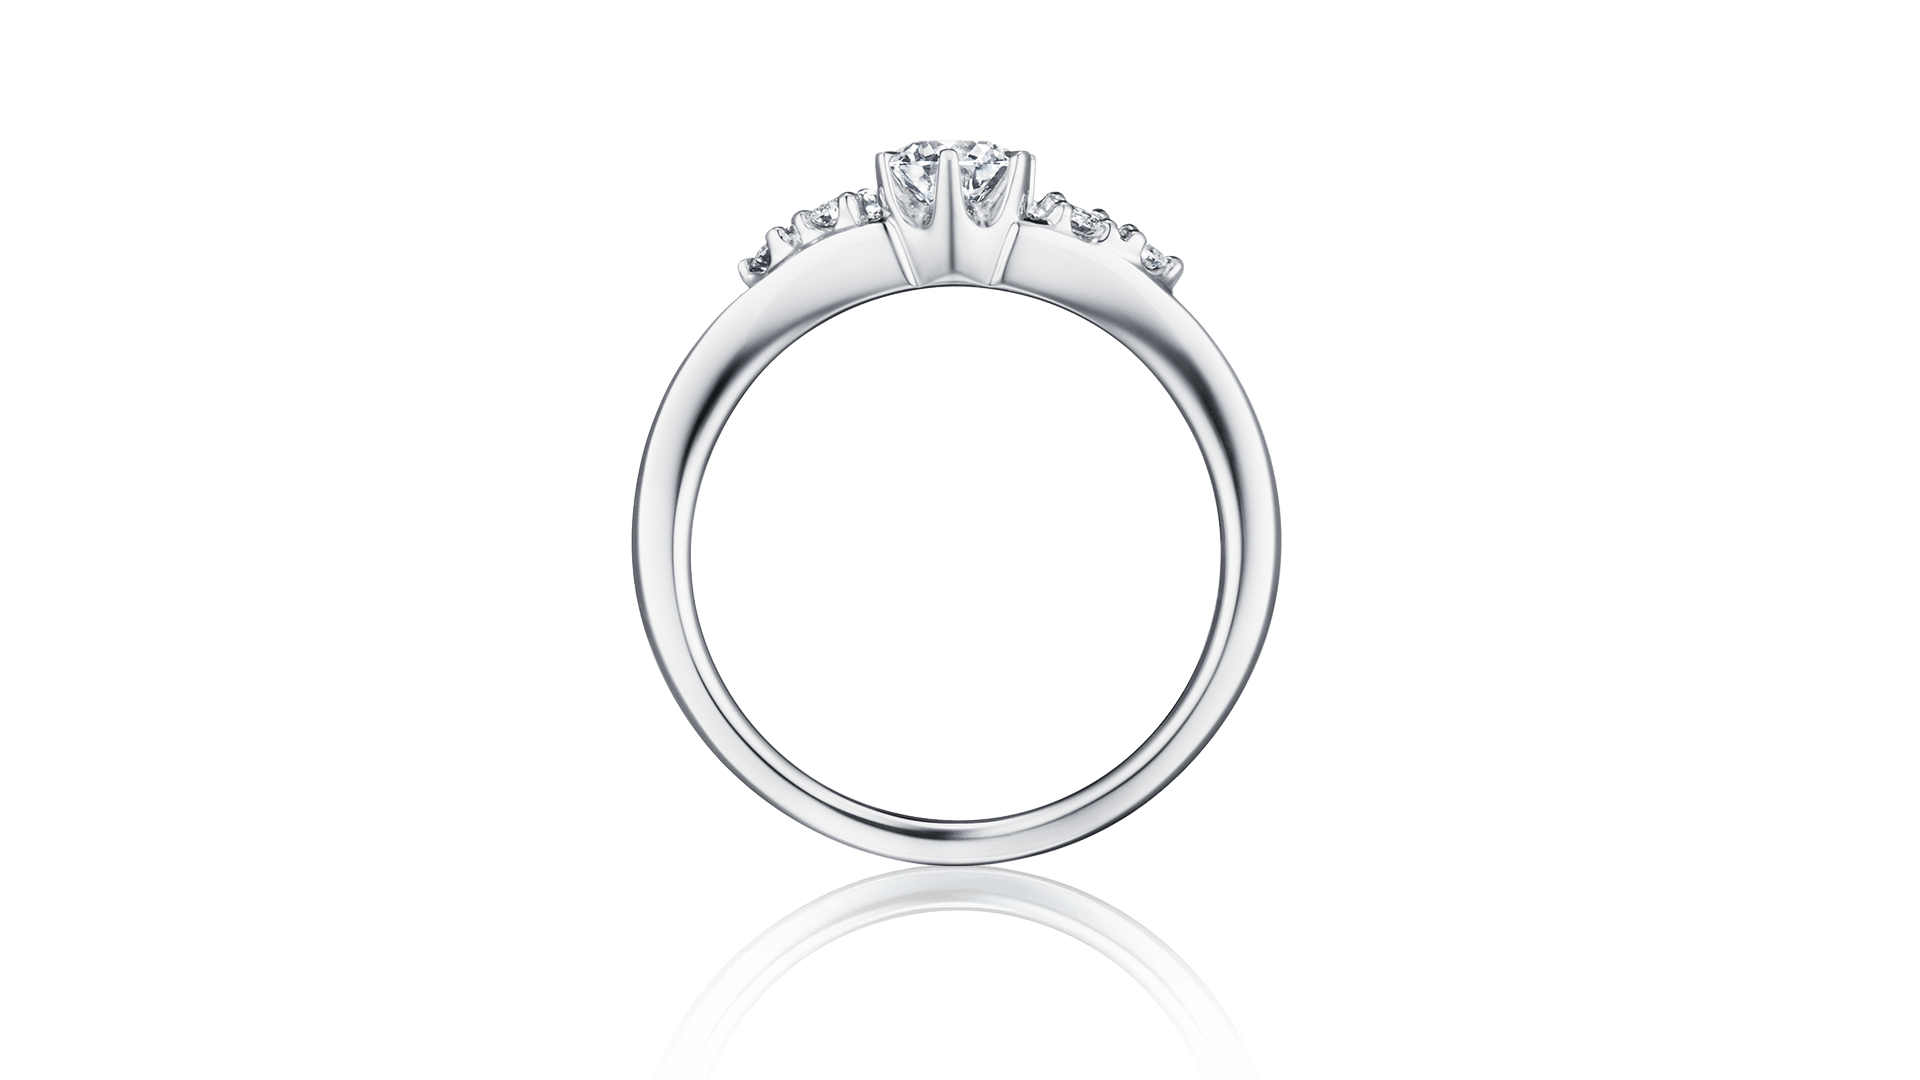 mizar ミザール | 婚約指輪サムネイル 2